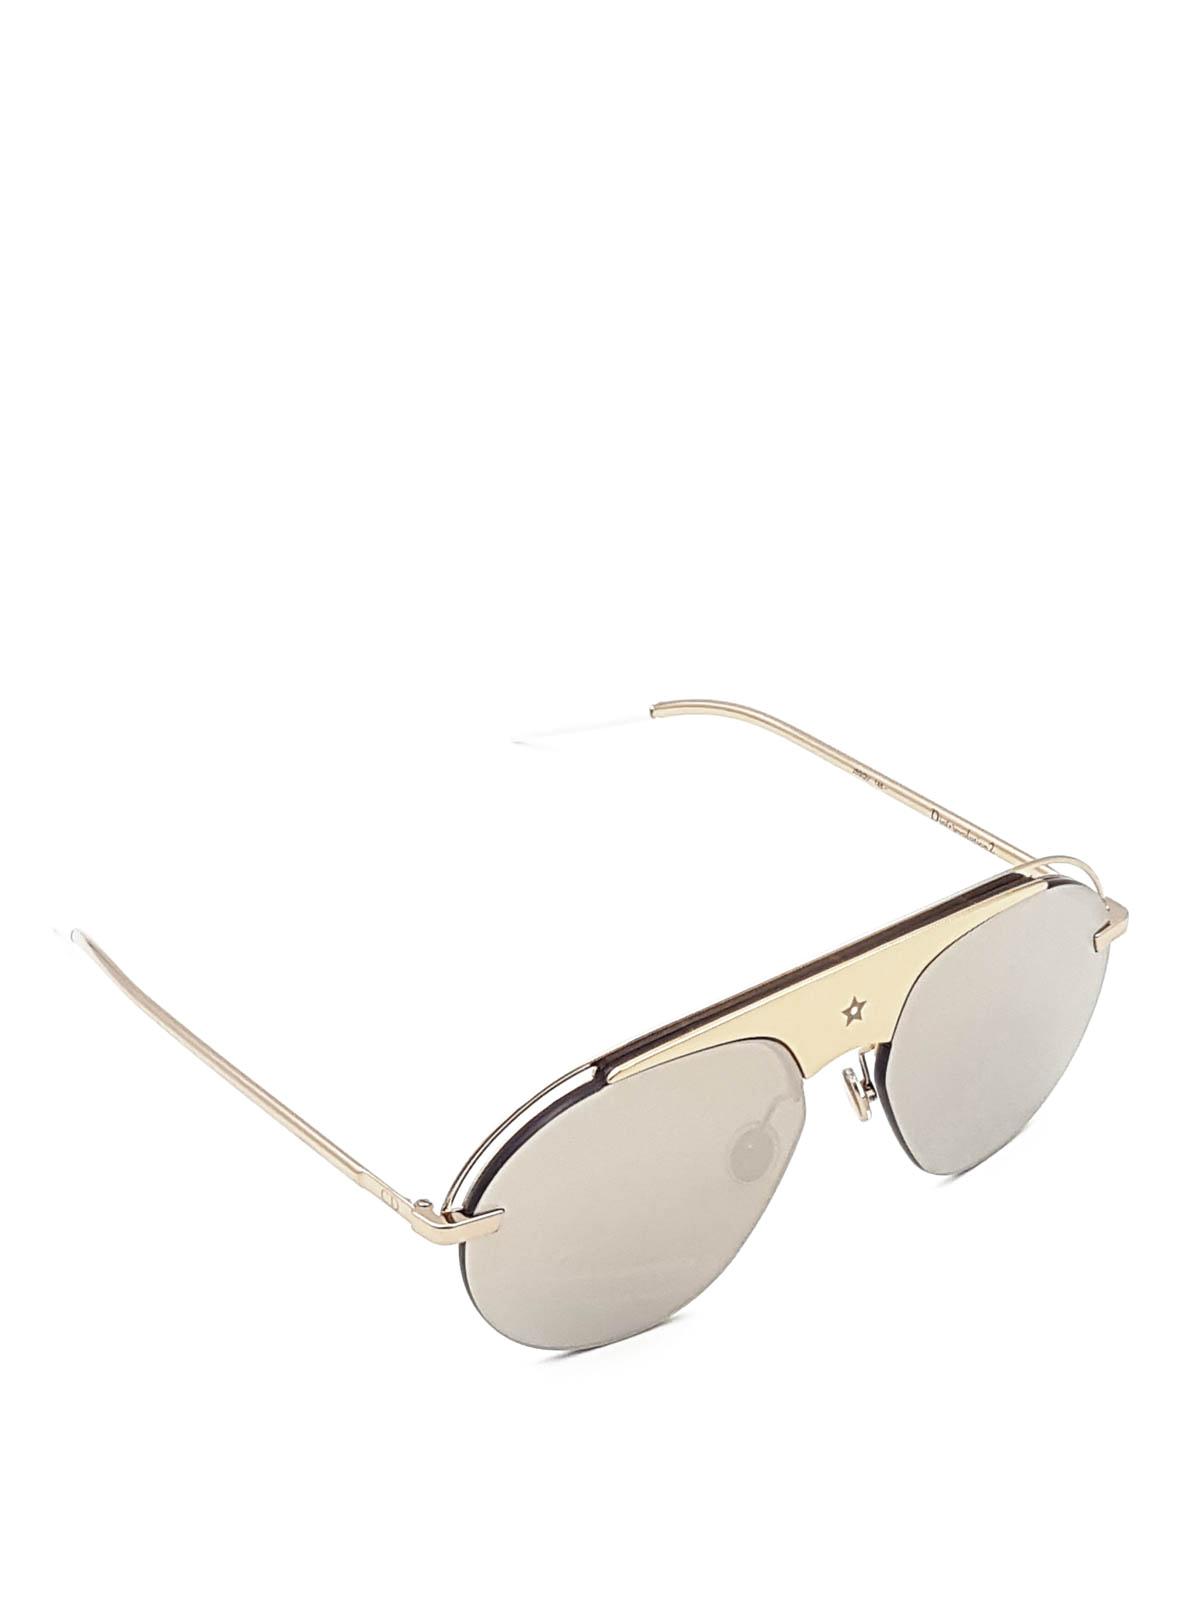 ee57431fdcdb6 Dior - Dio(r)evolution sunglasses - sunglasses - DIOREVOLUTION2J5G